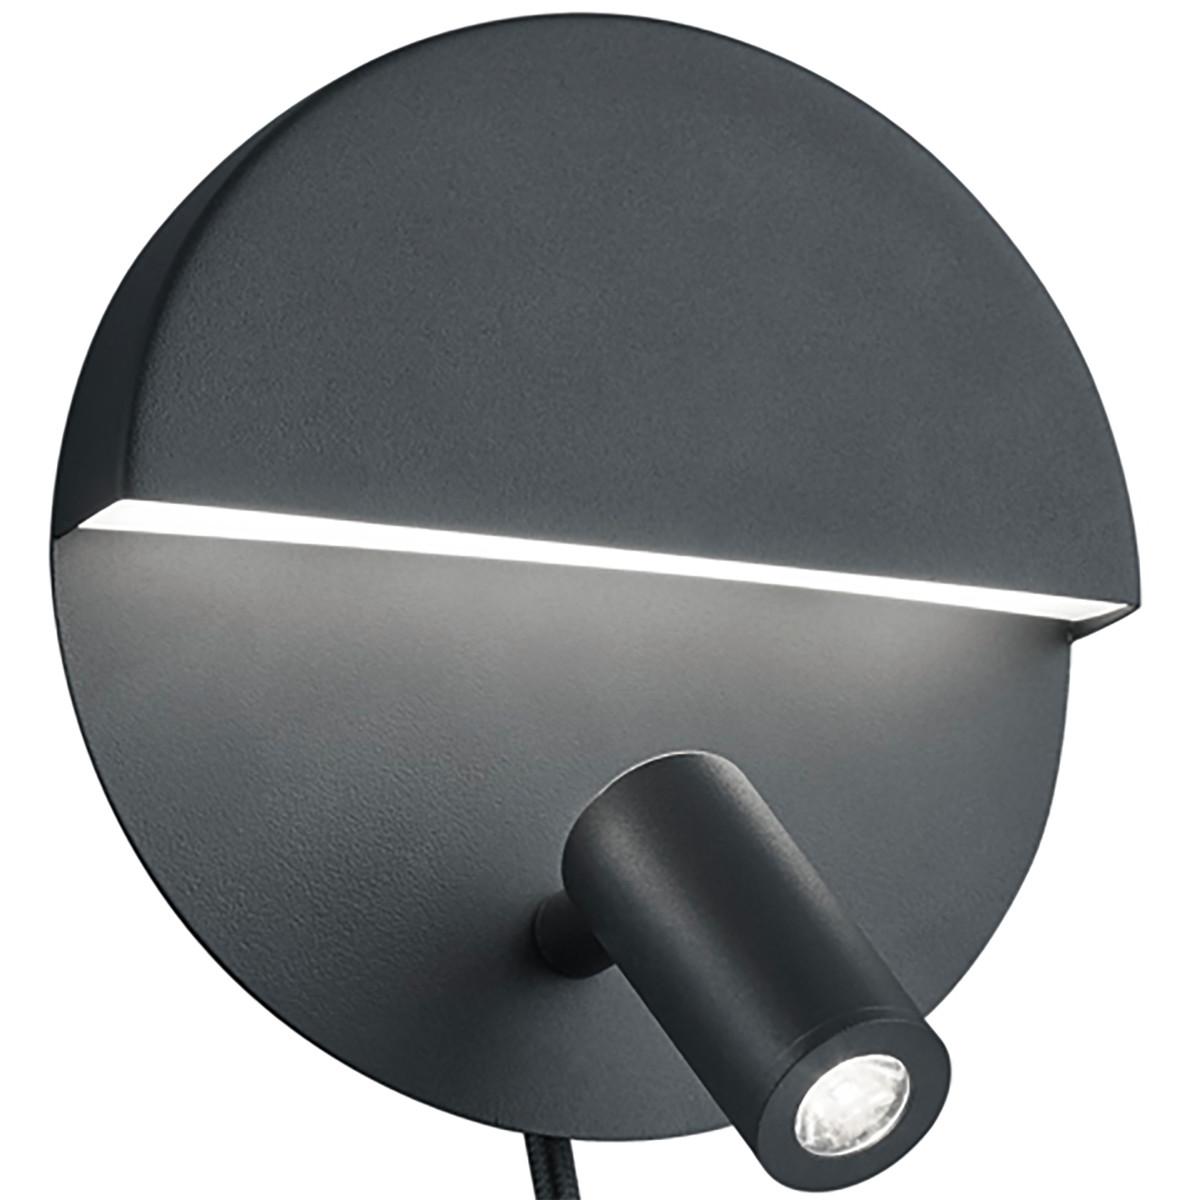 LED Wandlamp - Trion Marano - 8W - Warm Wit 3000K - Rond - Mat Zwart - Aluminium